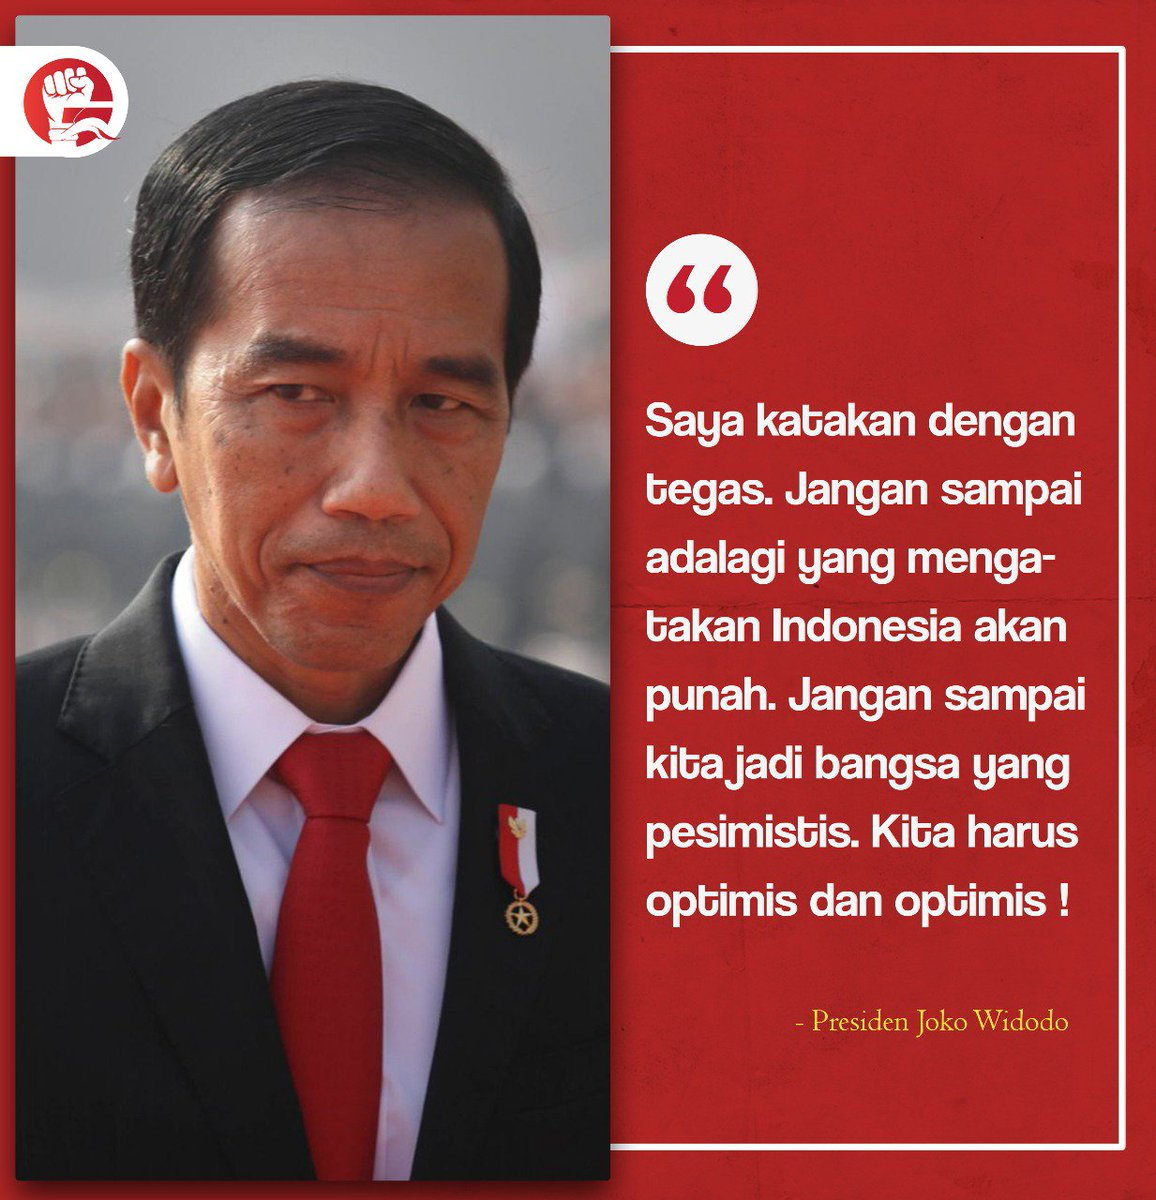 #jokowipresidenku #rekanjokowi #rekanjokowisulsel #ayoteruskerja #indonesiakuat https://t.co/omGtknnzyf